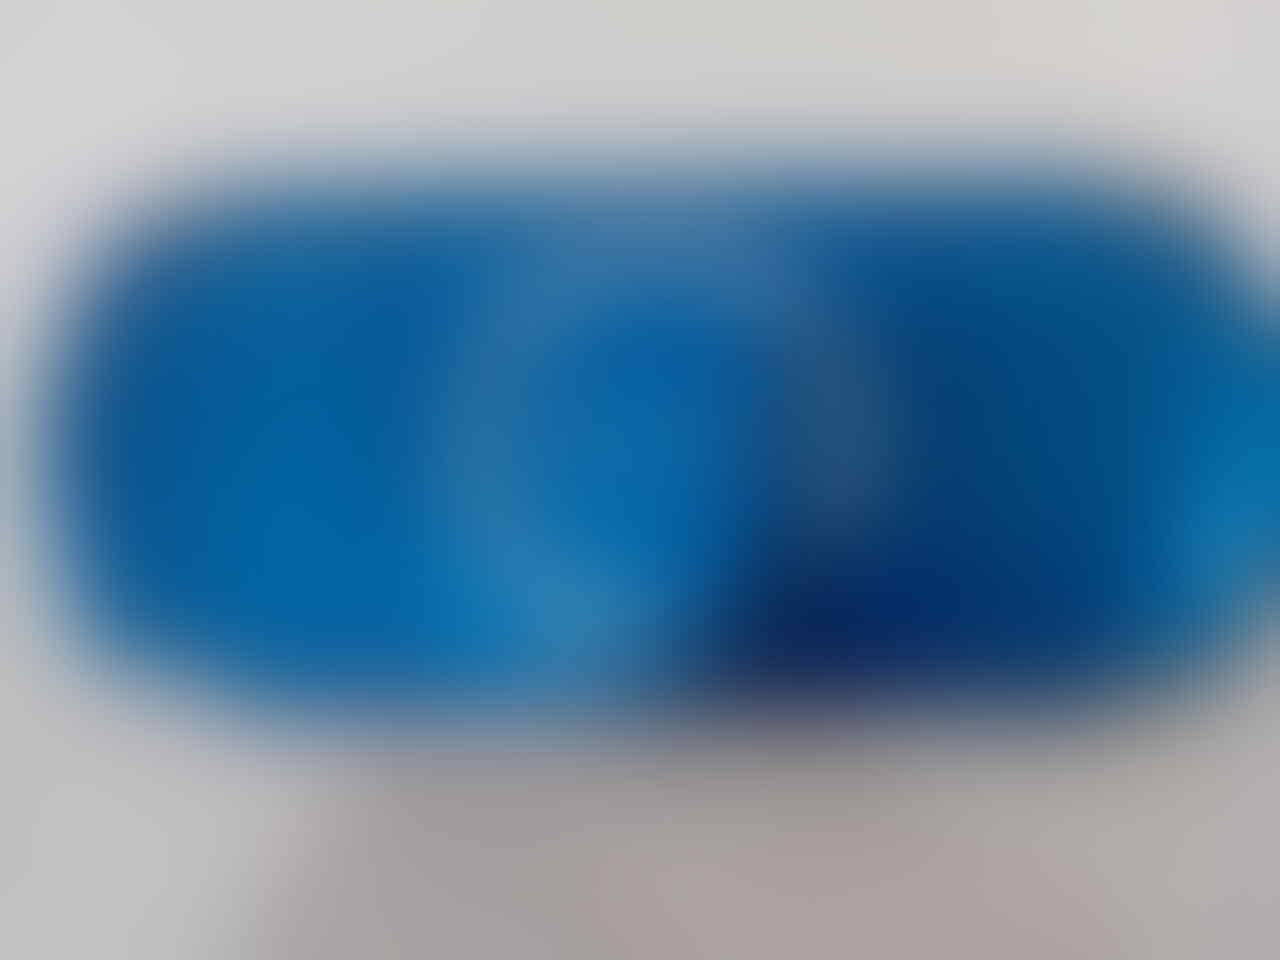 === PSP Slim 3006 Vibrant blue maknyusss gan !!! ===